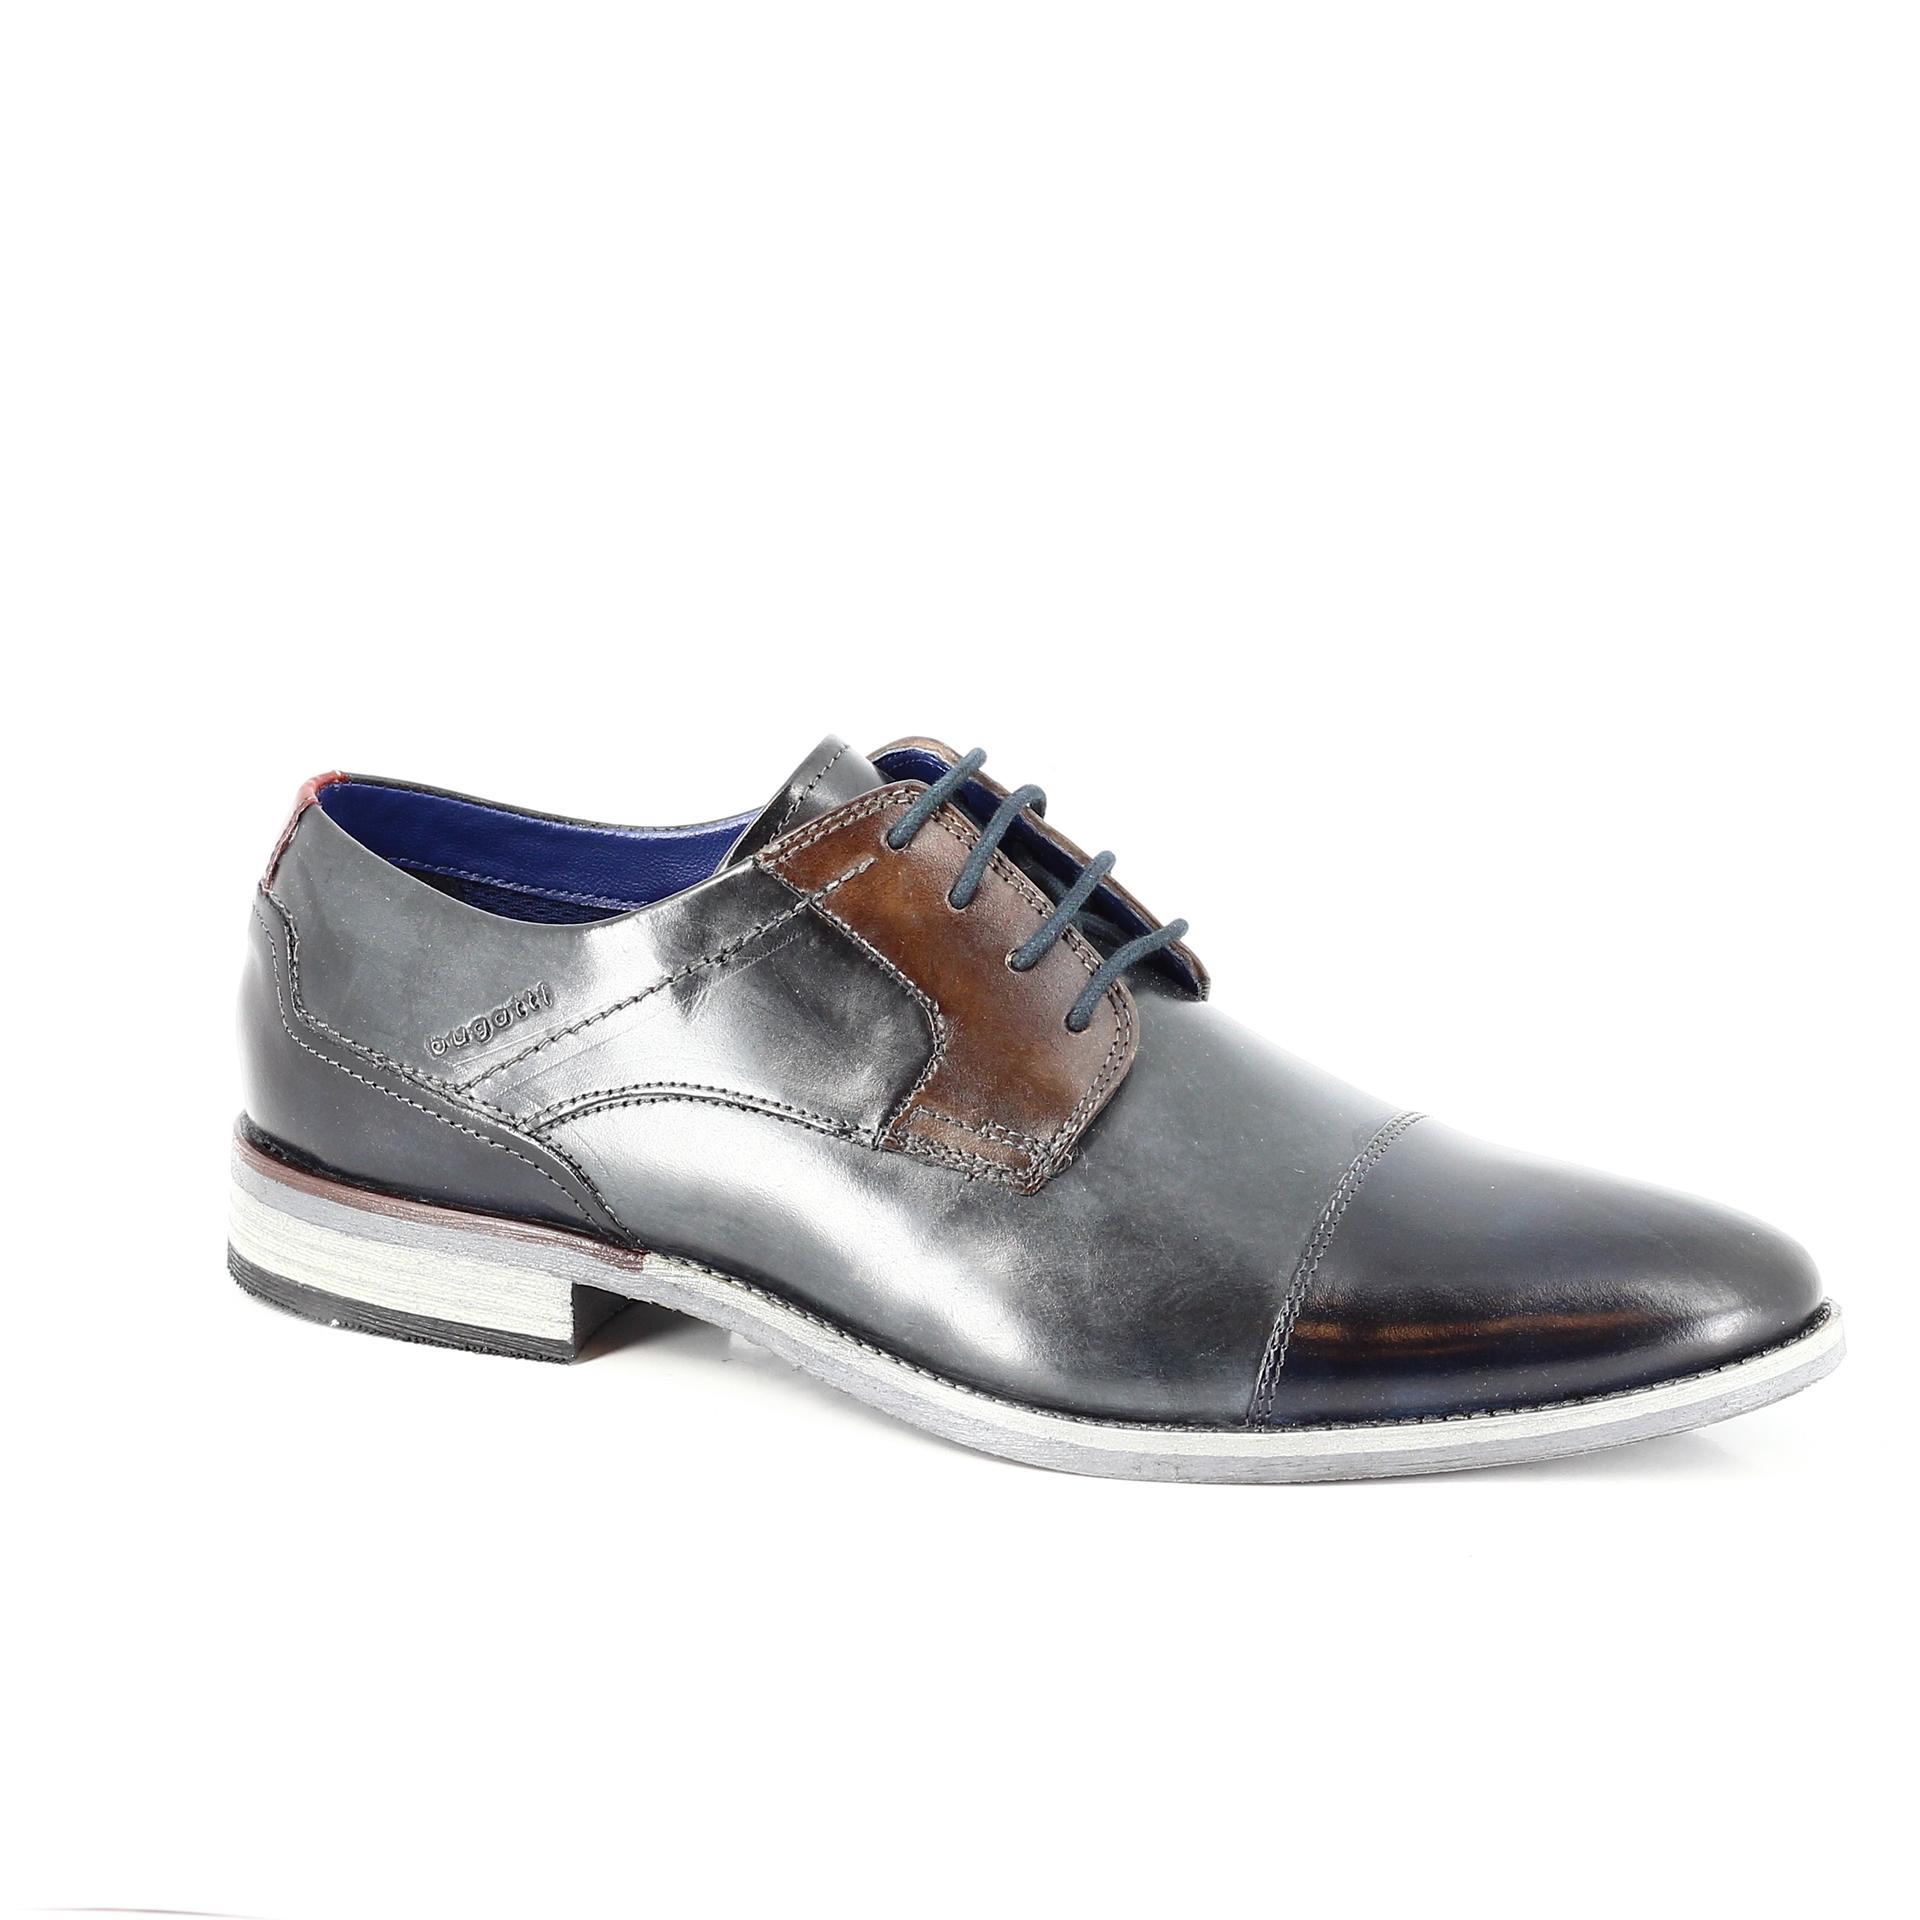 Bercolini Kényelmes cipők Bugatti, férfi, fél